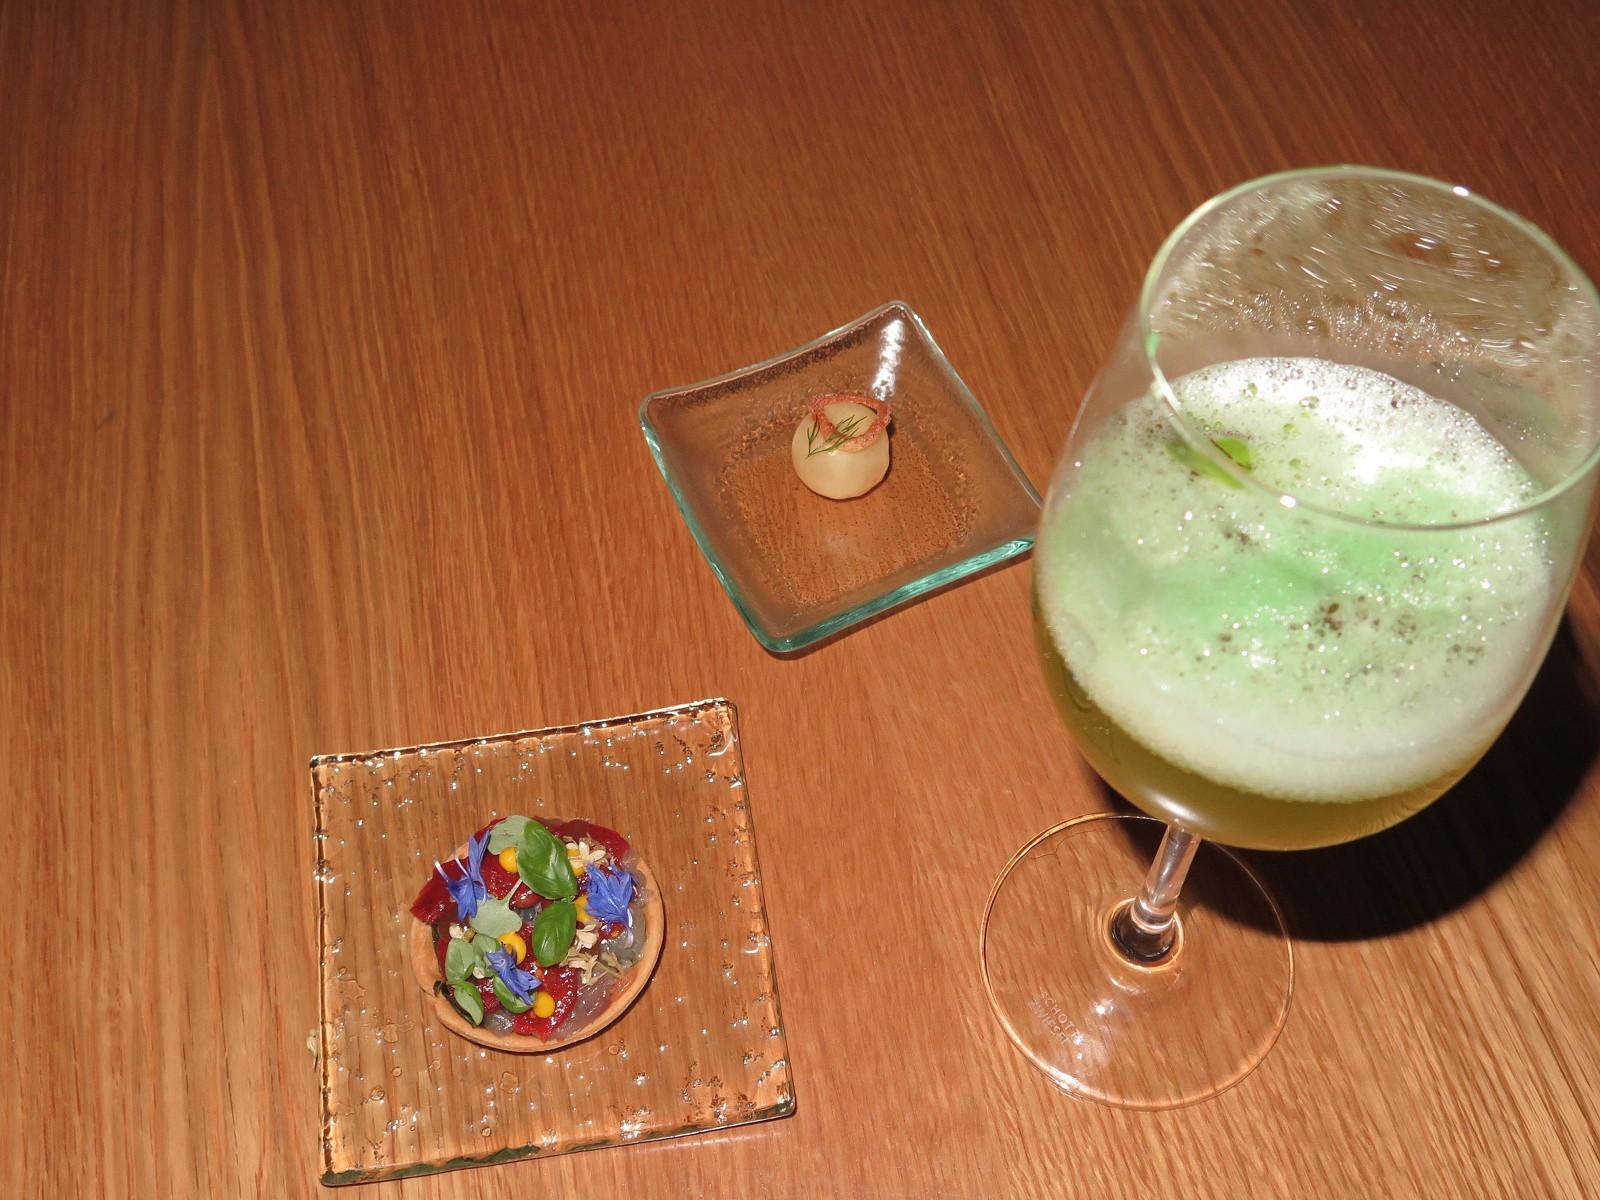 Mini Tarte (João Oliveira) + Cocktail de Vinho Branco (Nelson de Matos) + Esfera de Tangerina (Rui Mota)